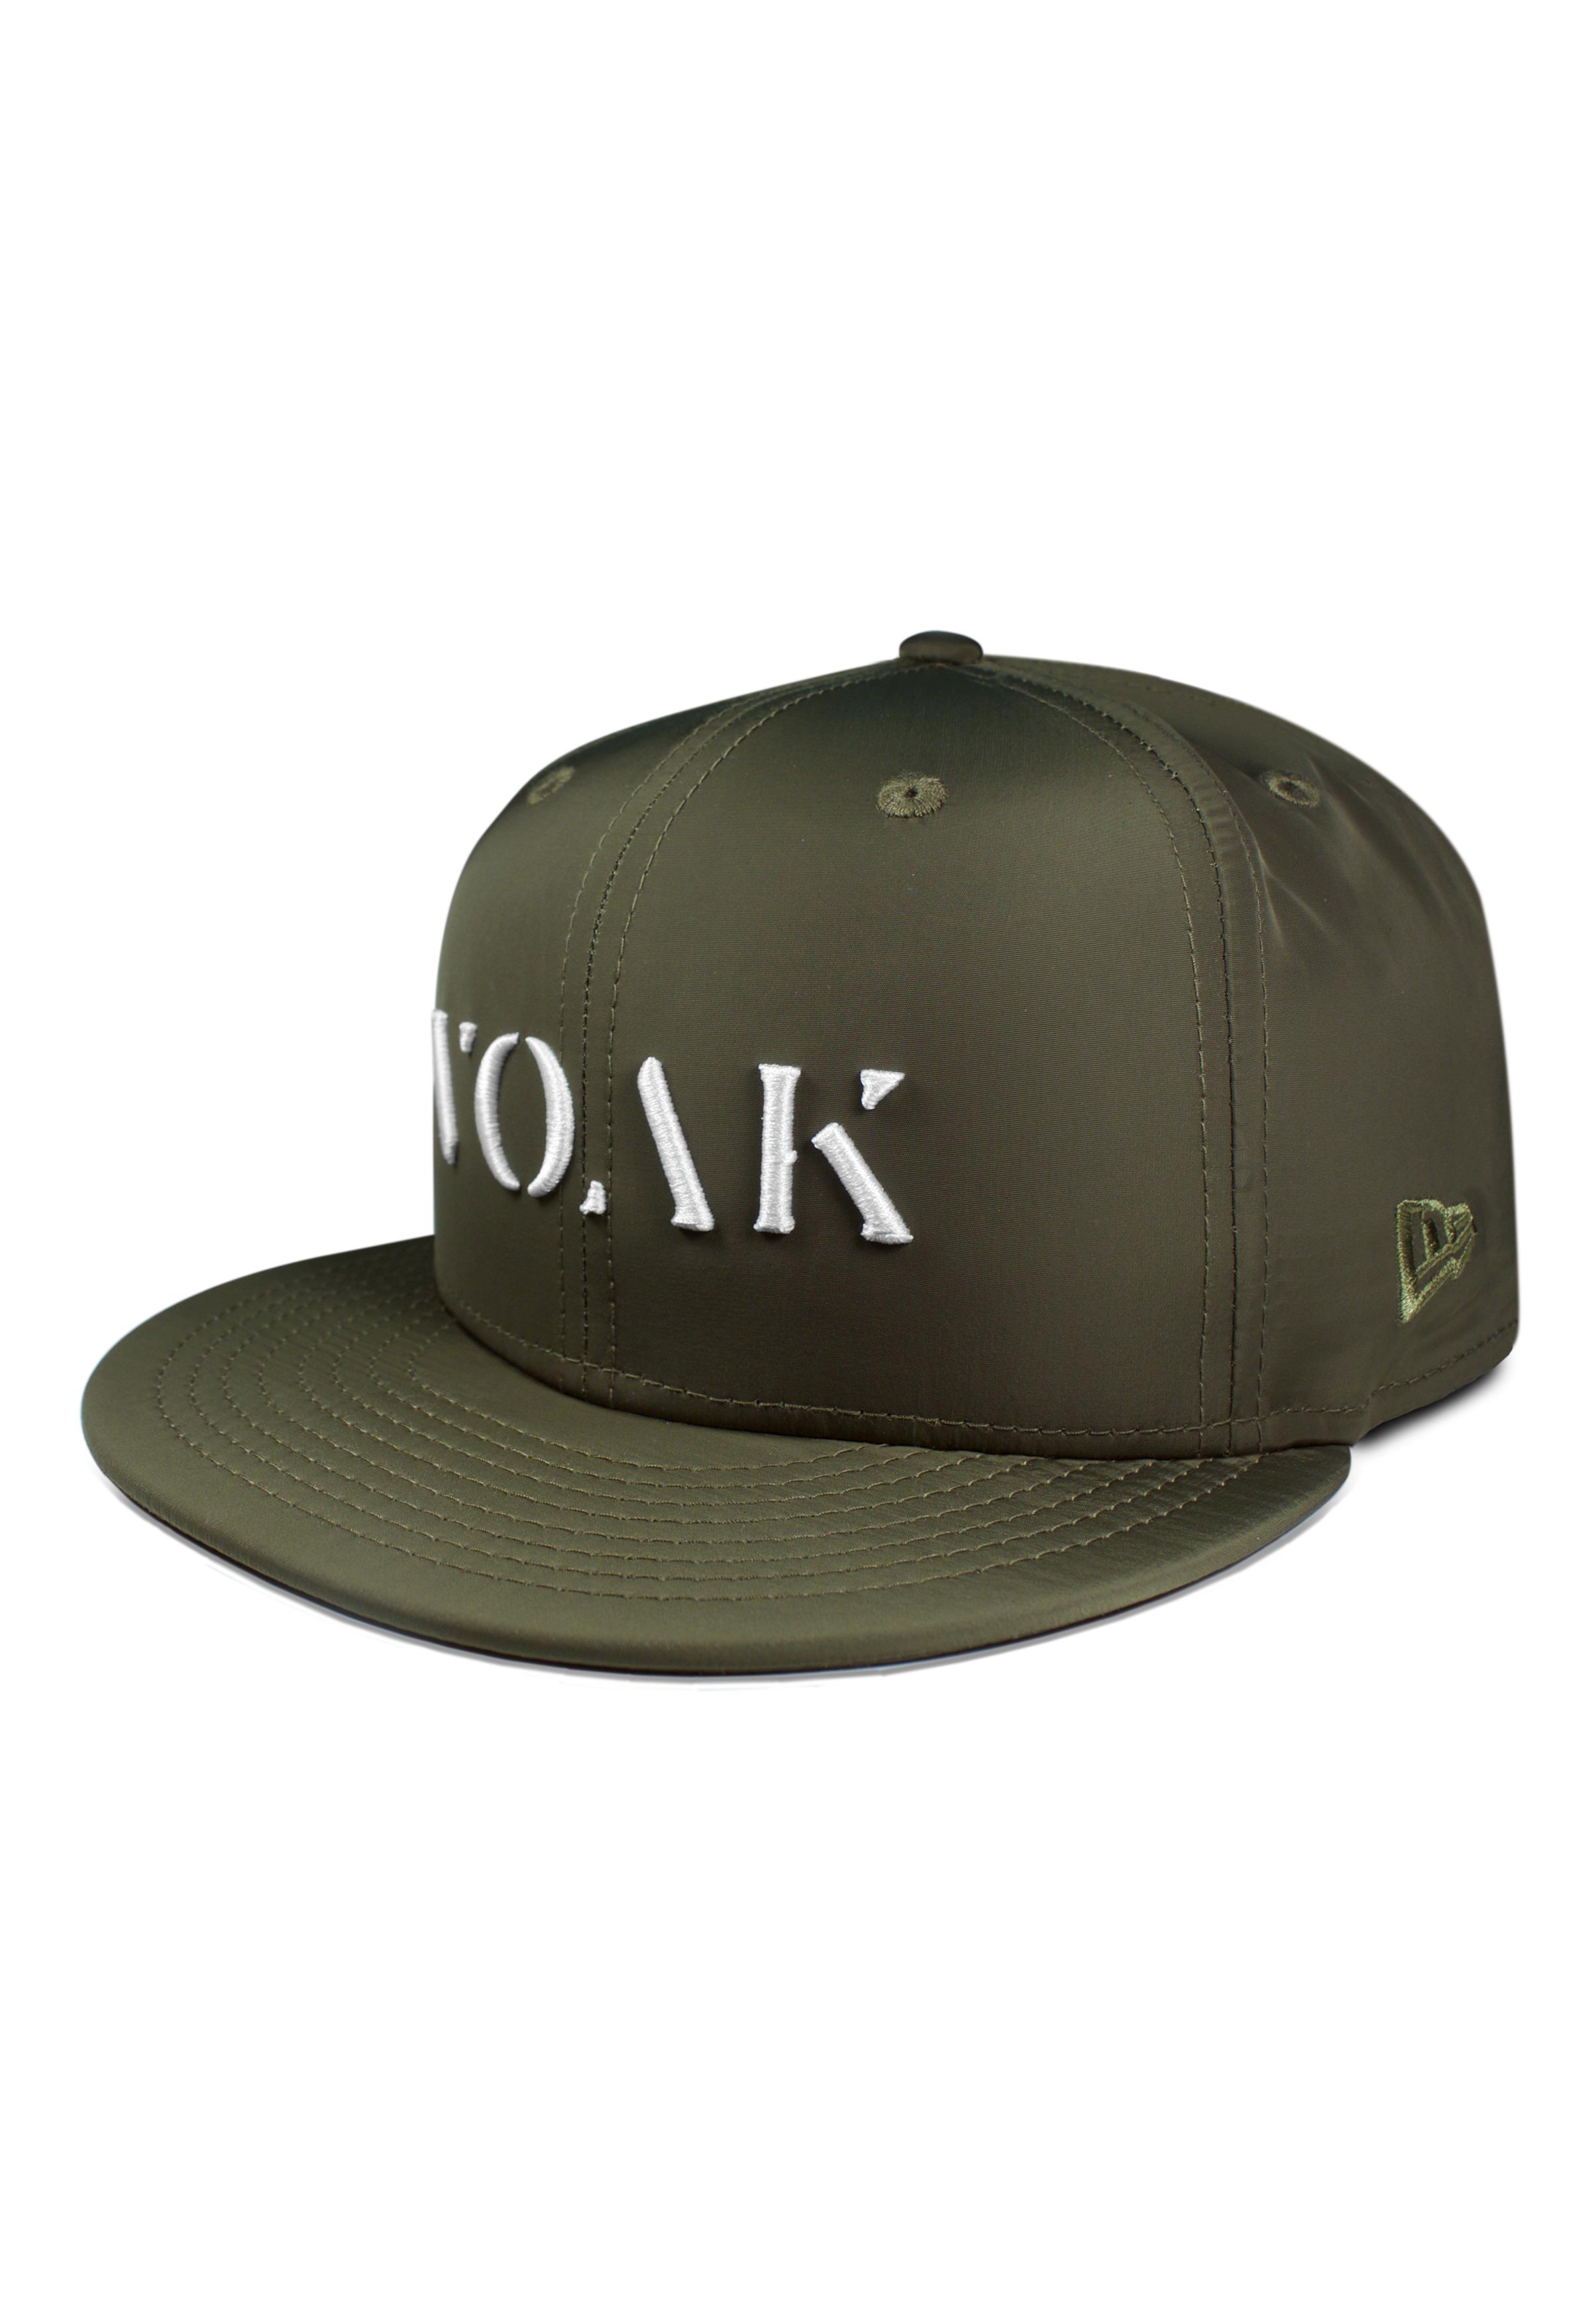 Flint New Era 9Fifty Snapback Cap - VOAK Sportswear dab6aaf154